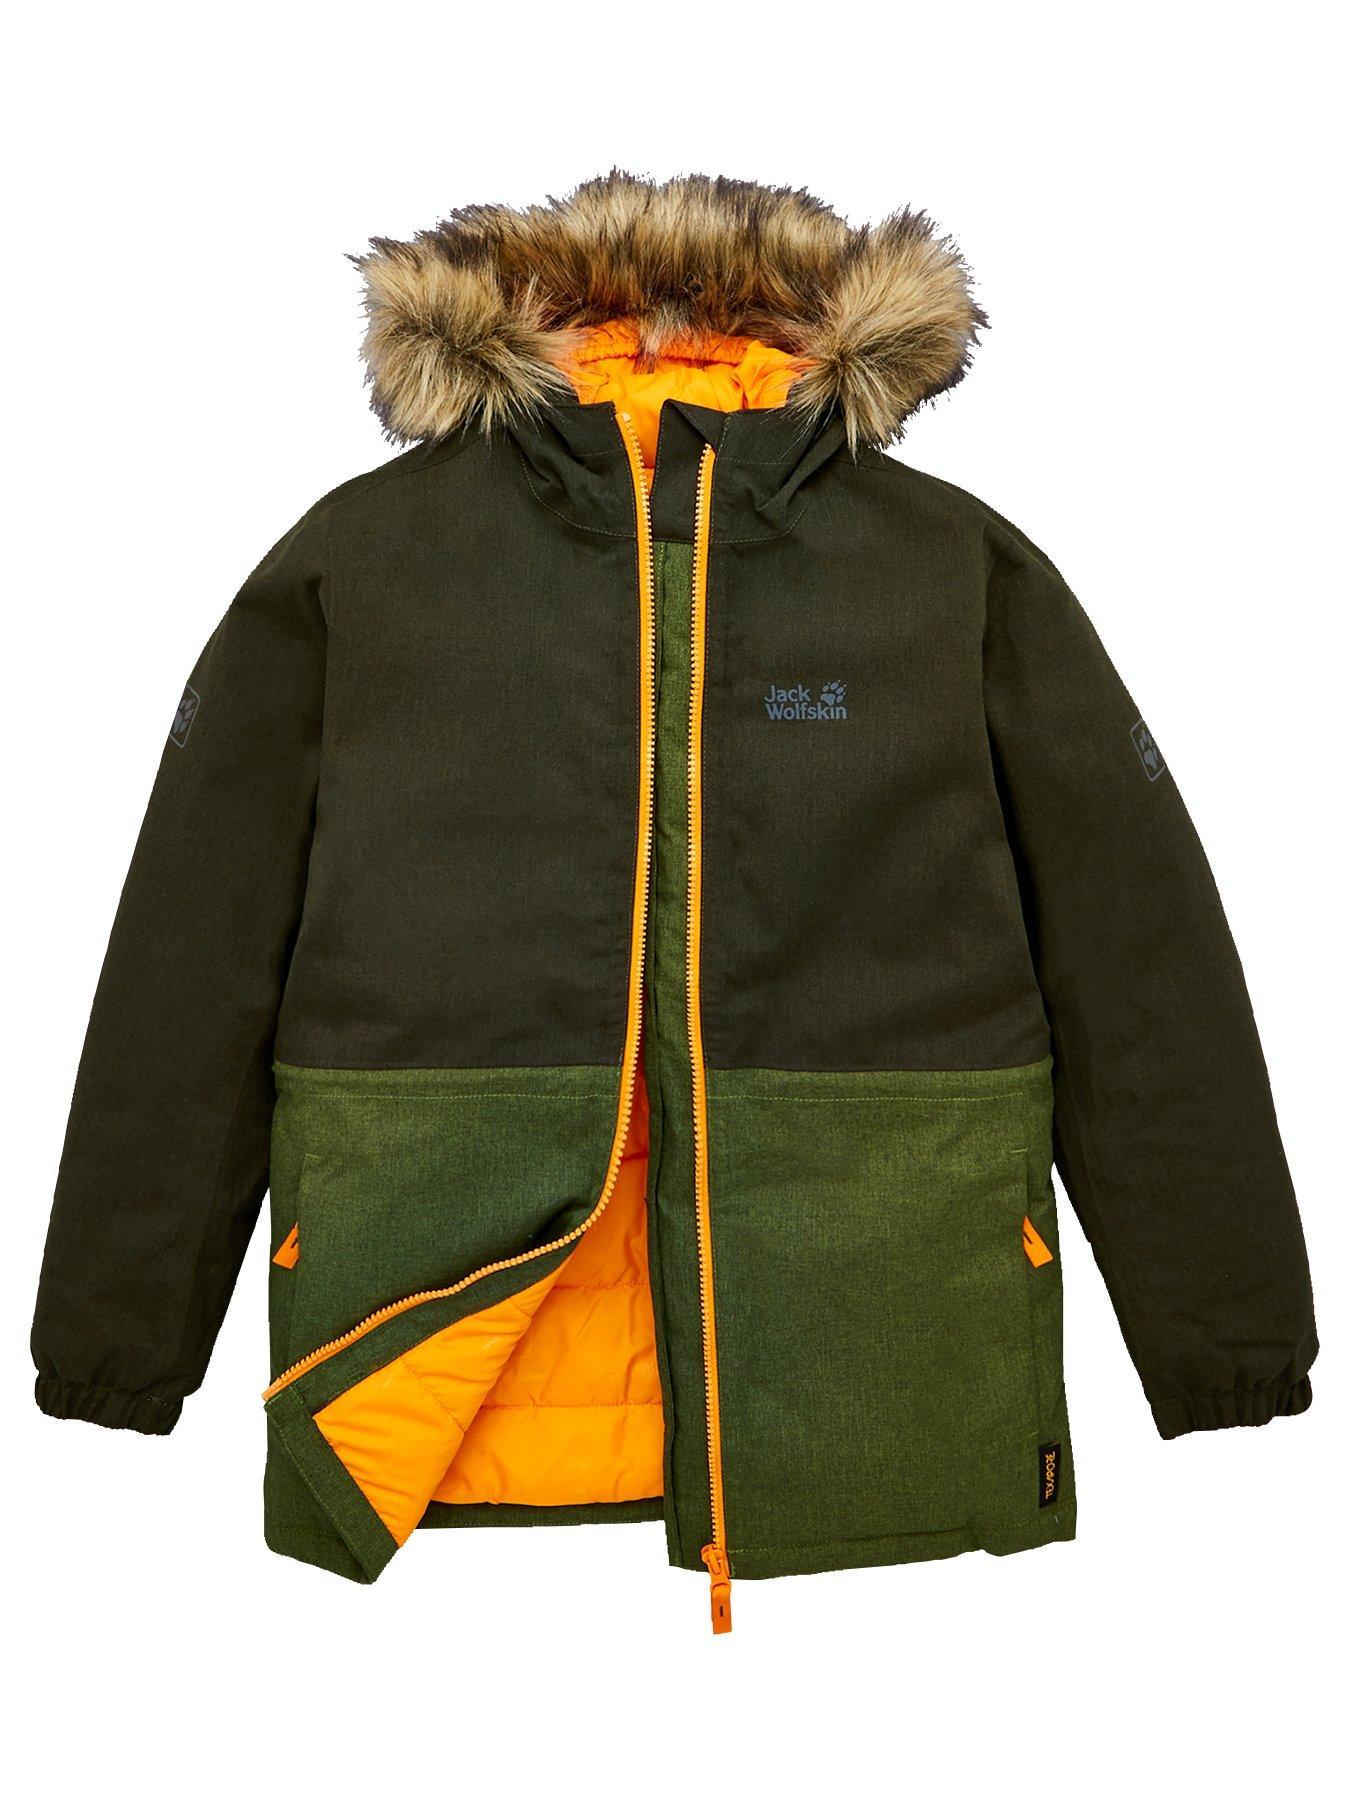 Details about Jack Wolfskin Baksmalla Fleece Jacket Kid's Camping Hiking Outdoors